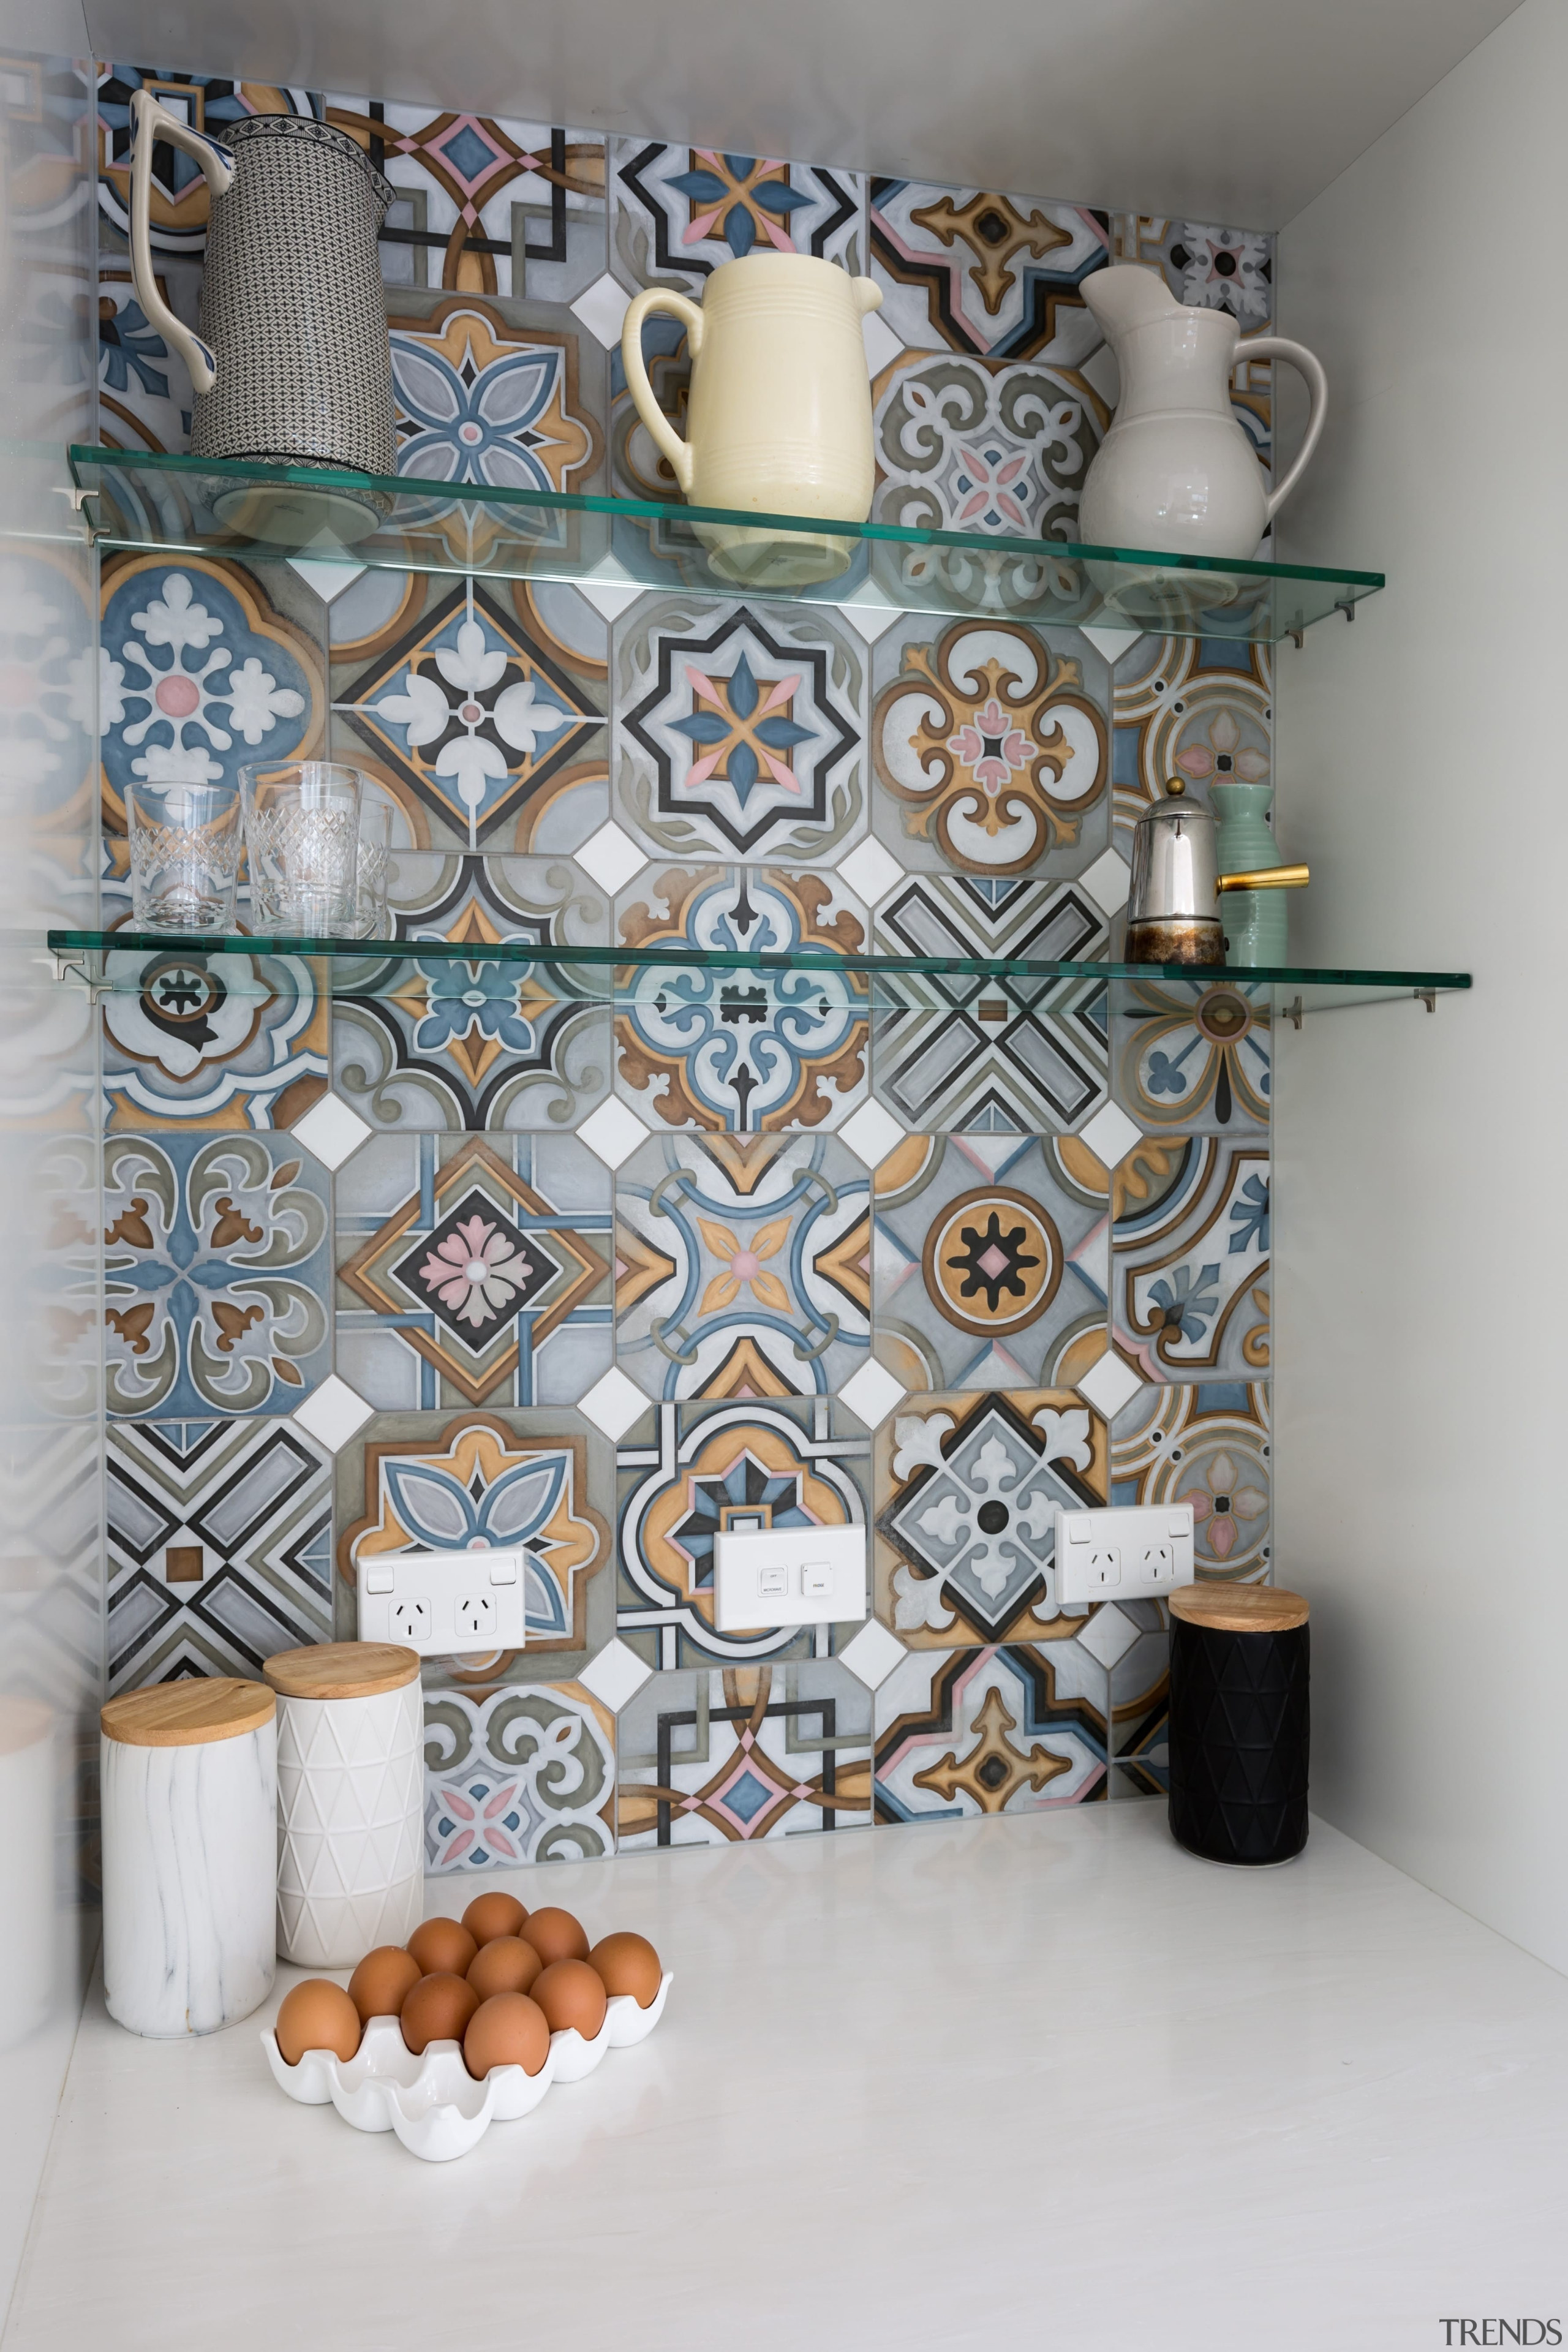 Kitchen Tile - Kitchen Tile - interior design interior design, pattern, room, wall, gray